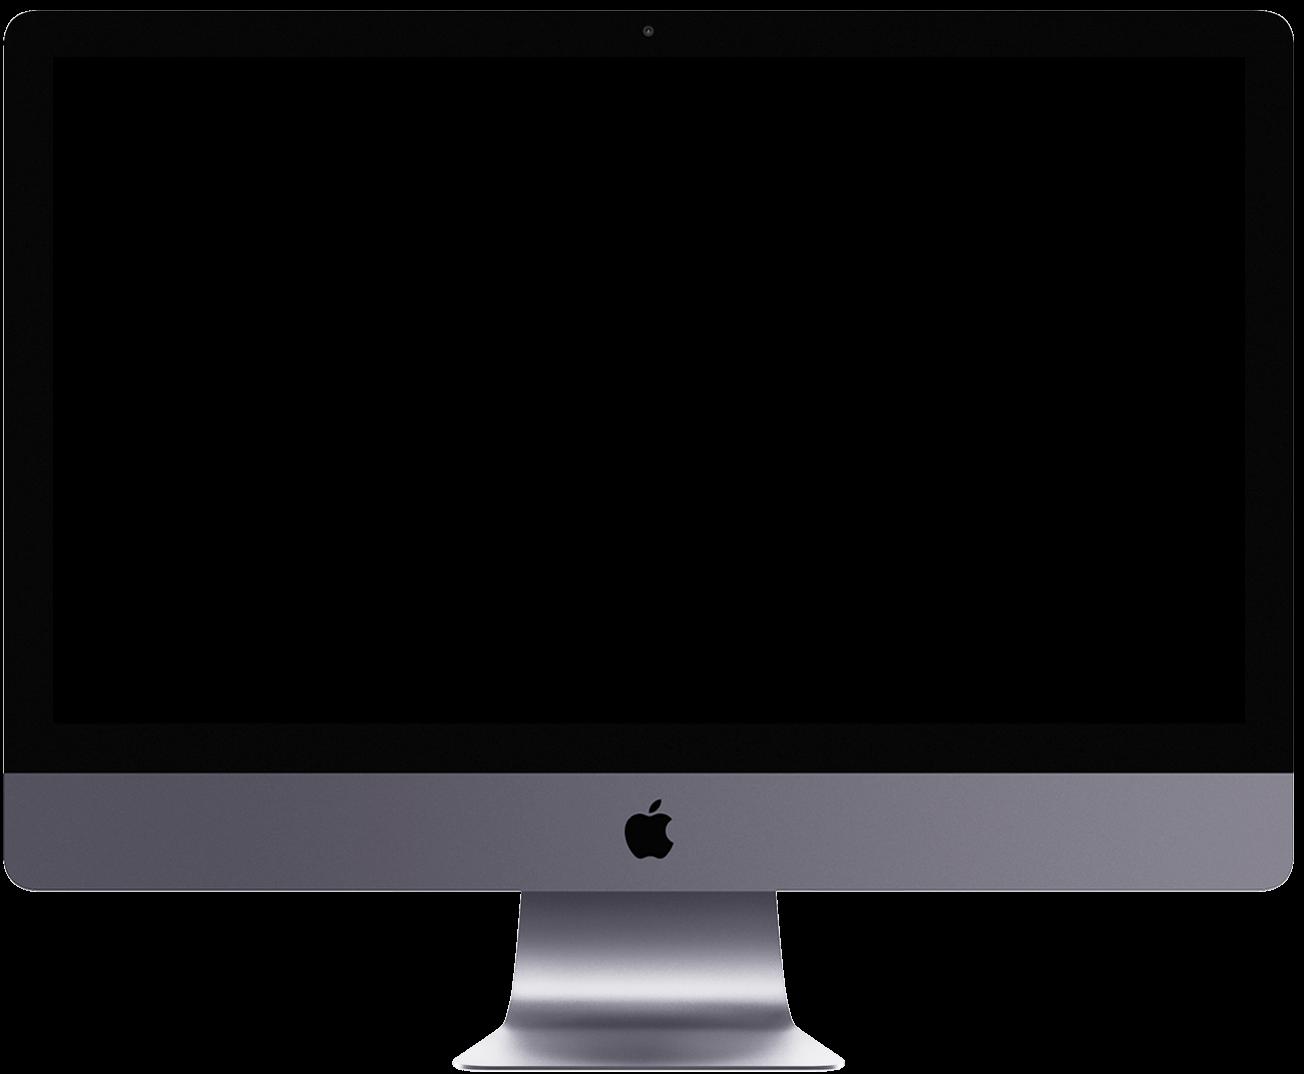 Mockup eines iMacs, in dem die Aksis Werbeagentur Projekte präsentiert.